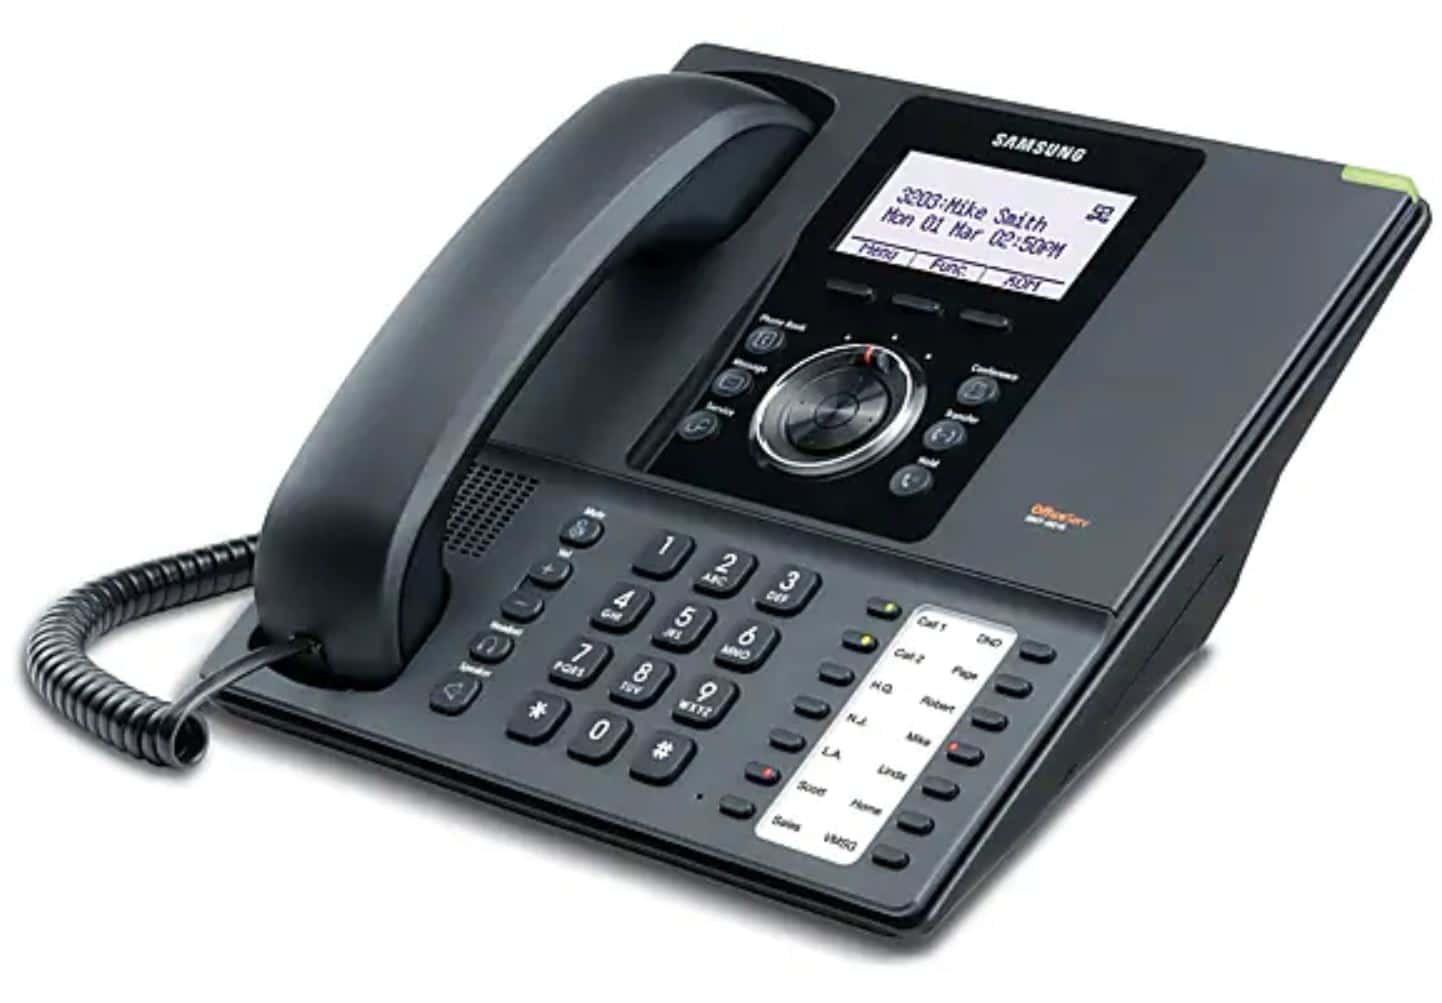 Samsung SMT-i5210 IP Phone Image